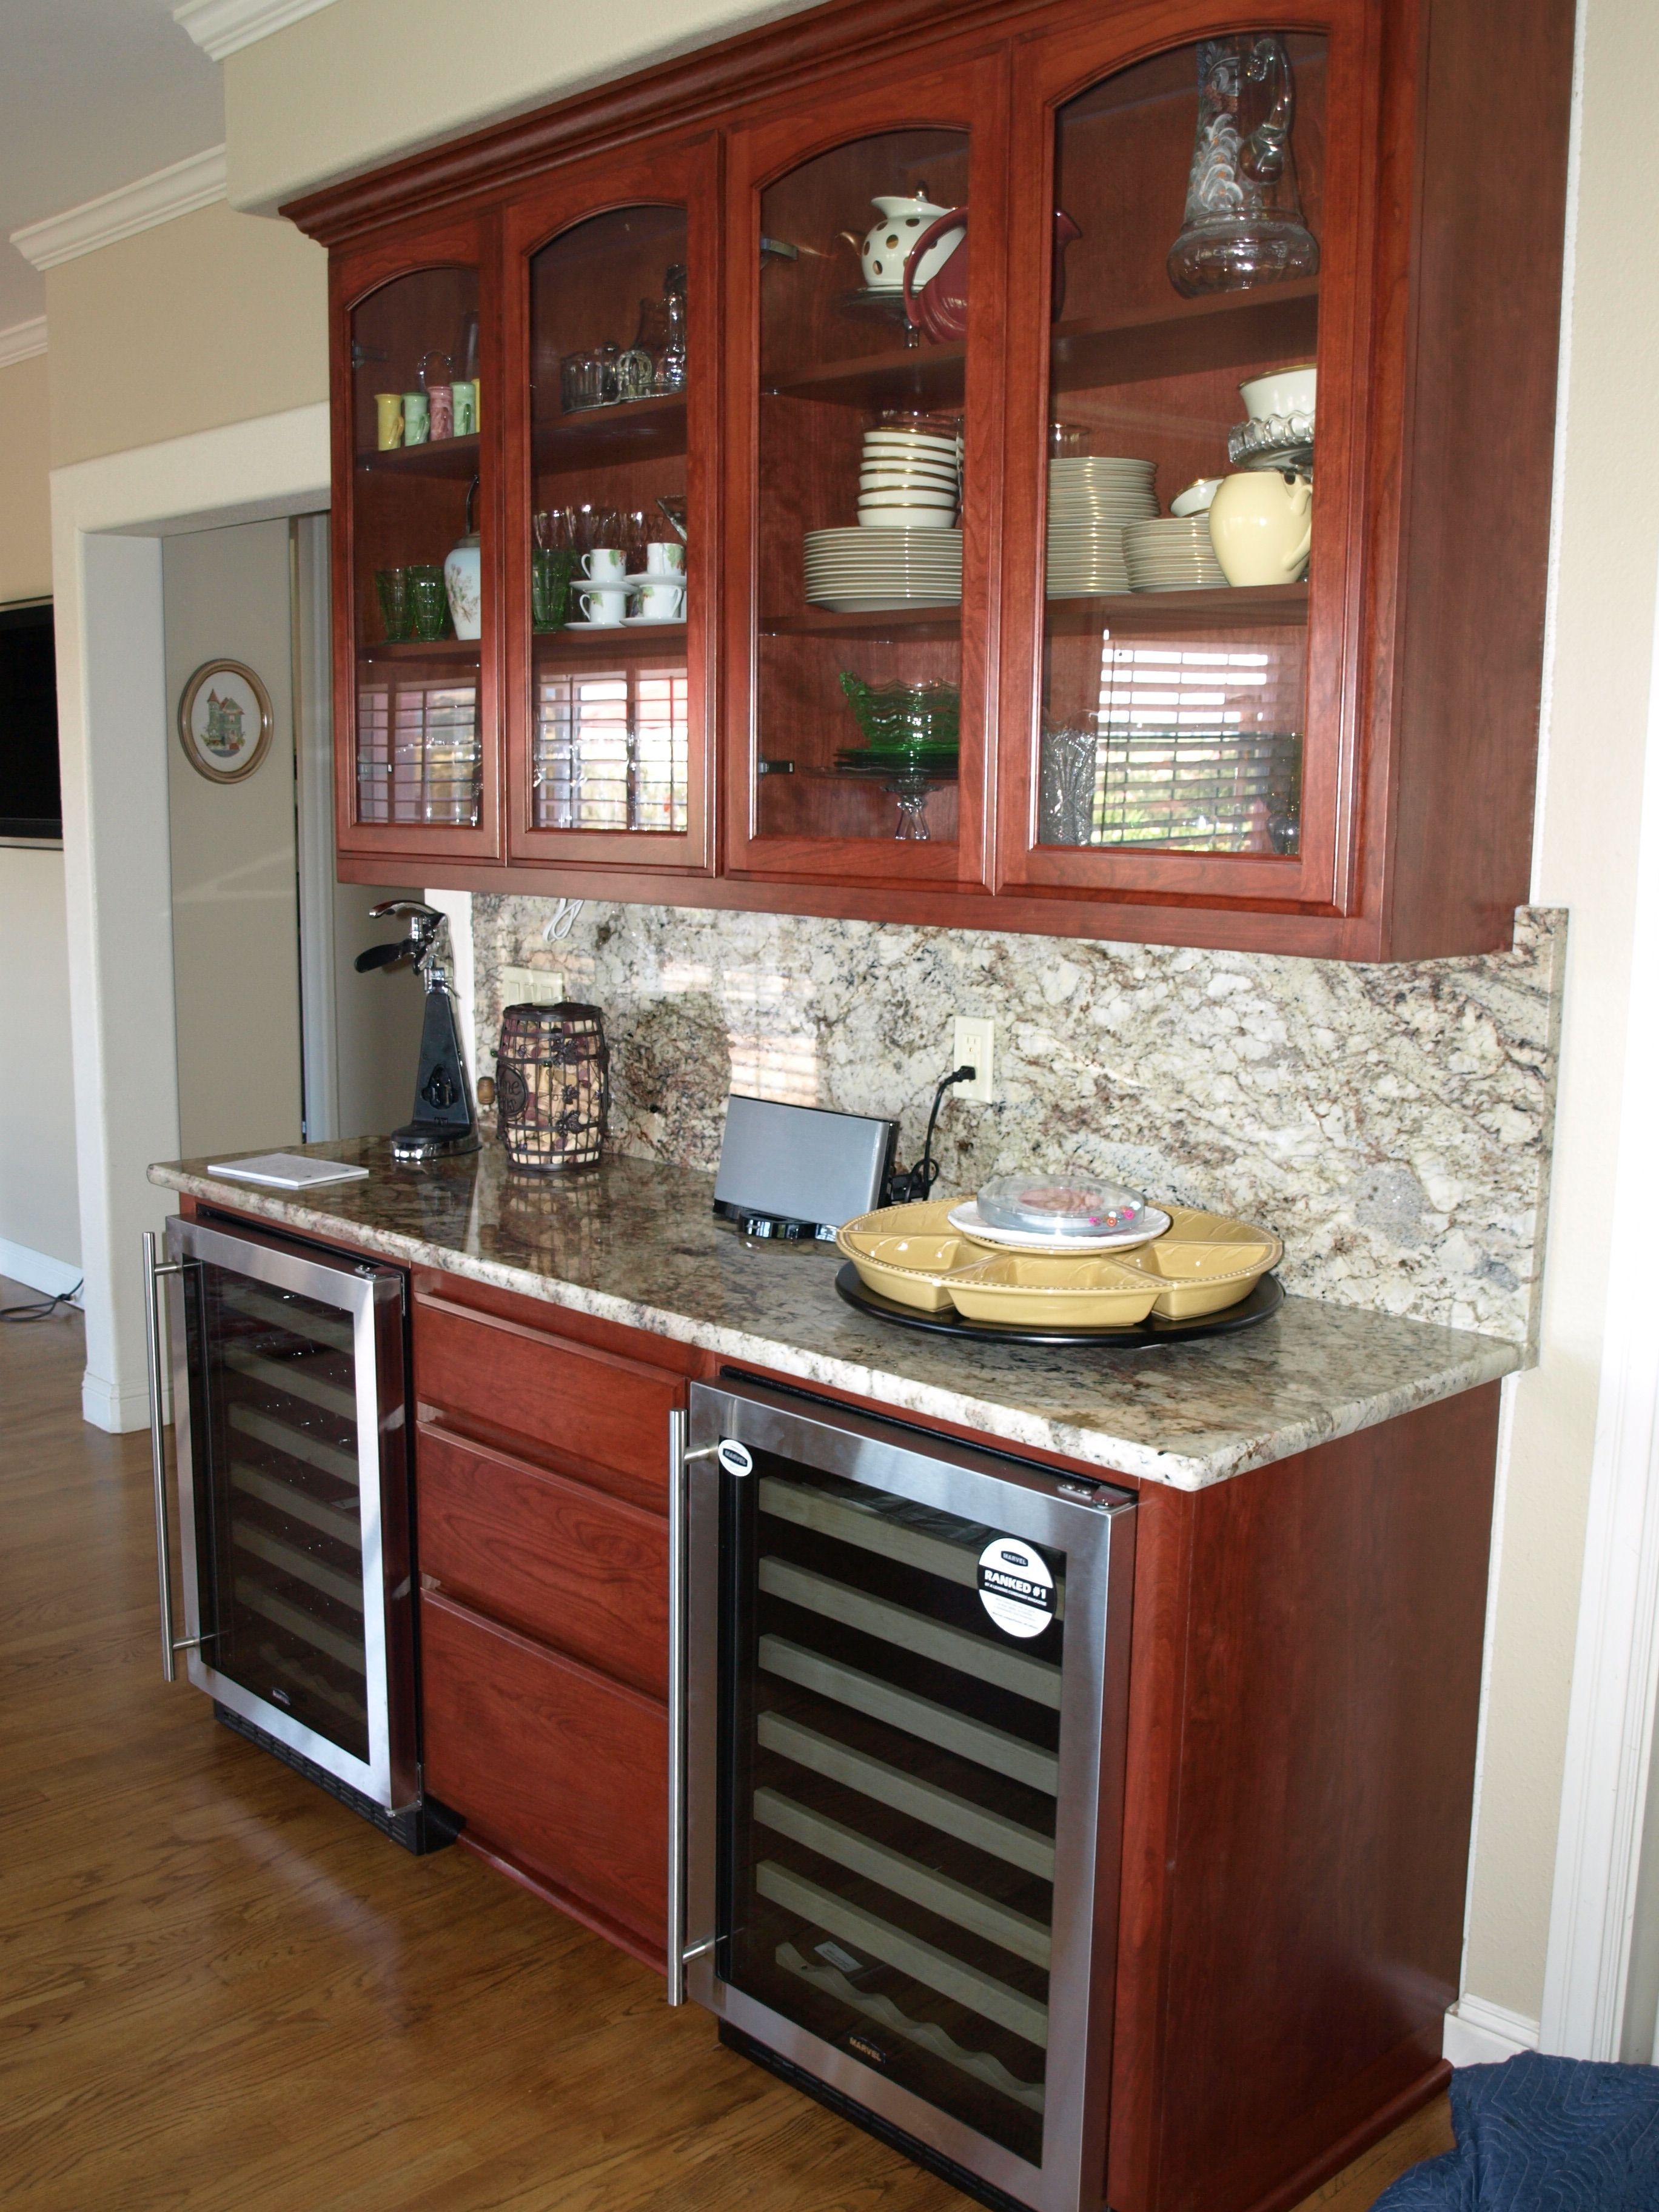 North County Kitchens, Petaluma, CA, Cherry Cabinets in ...